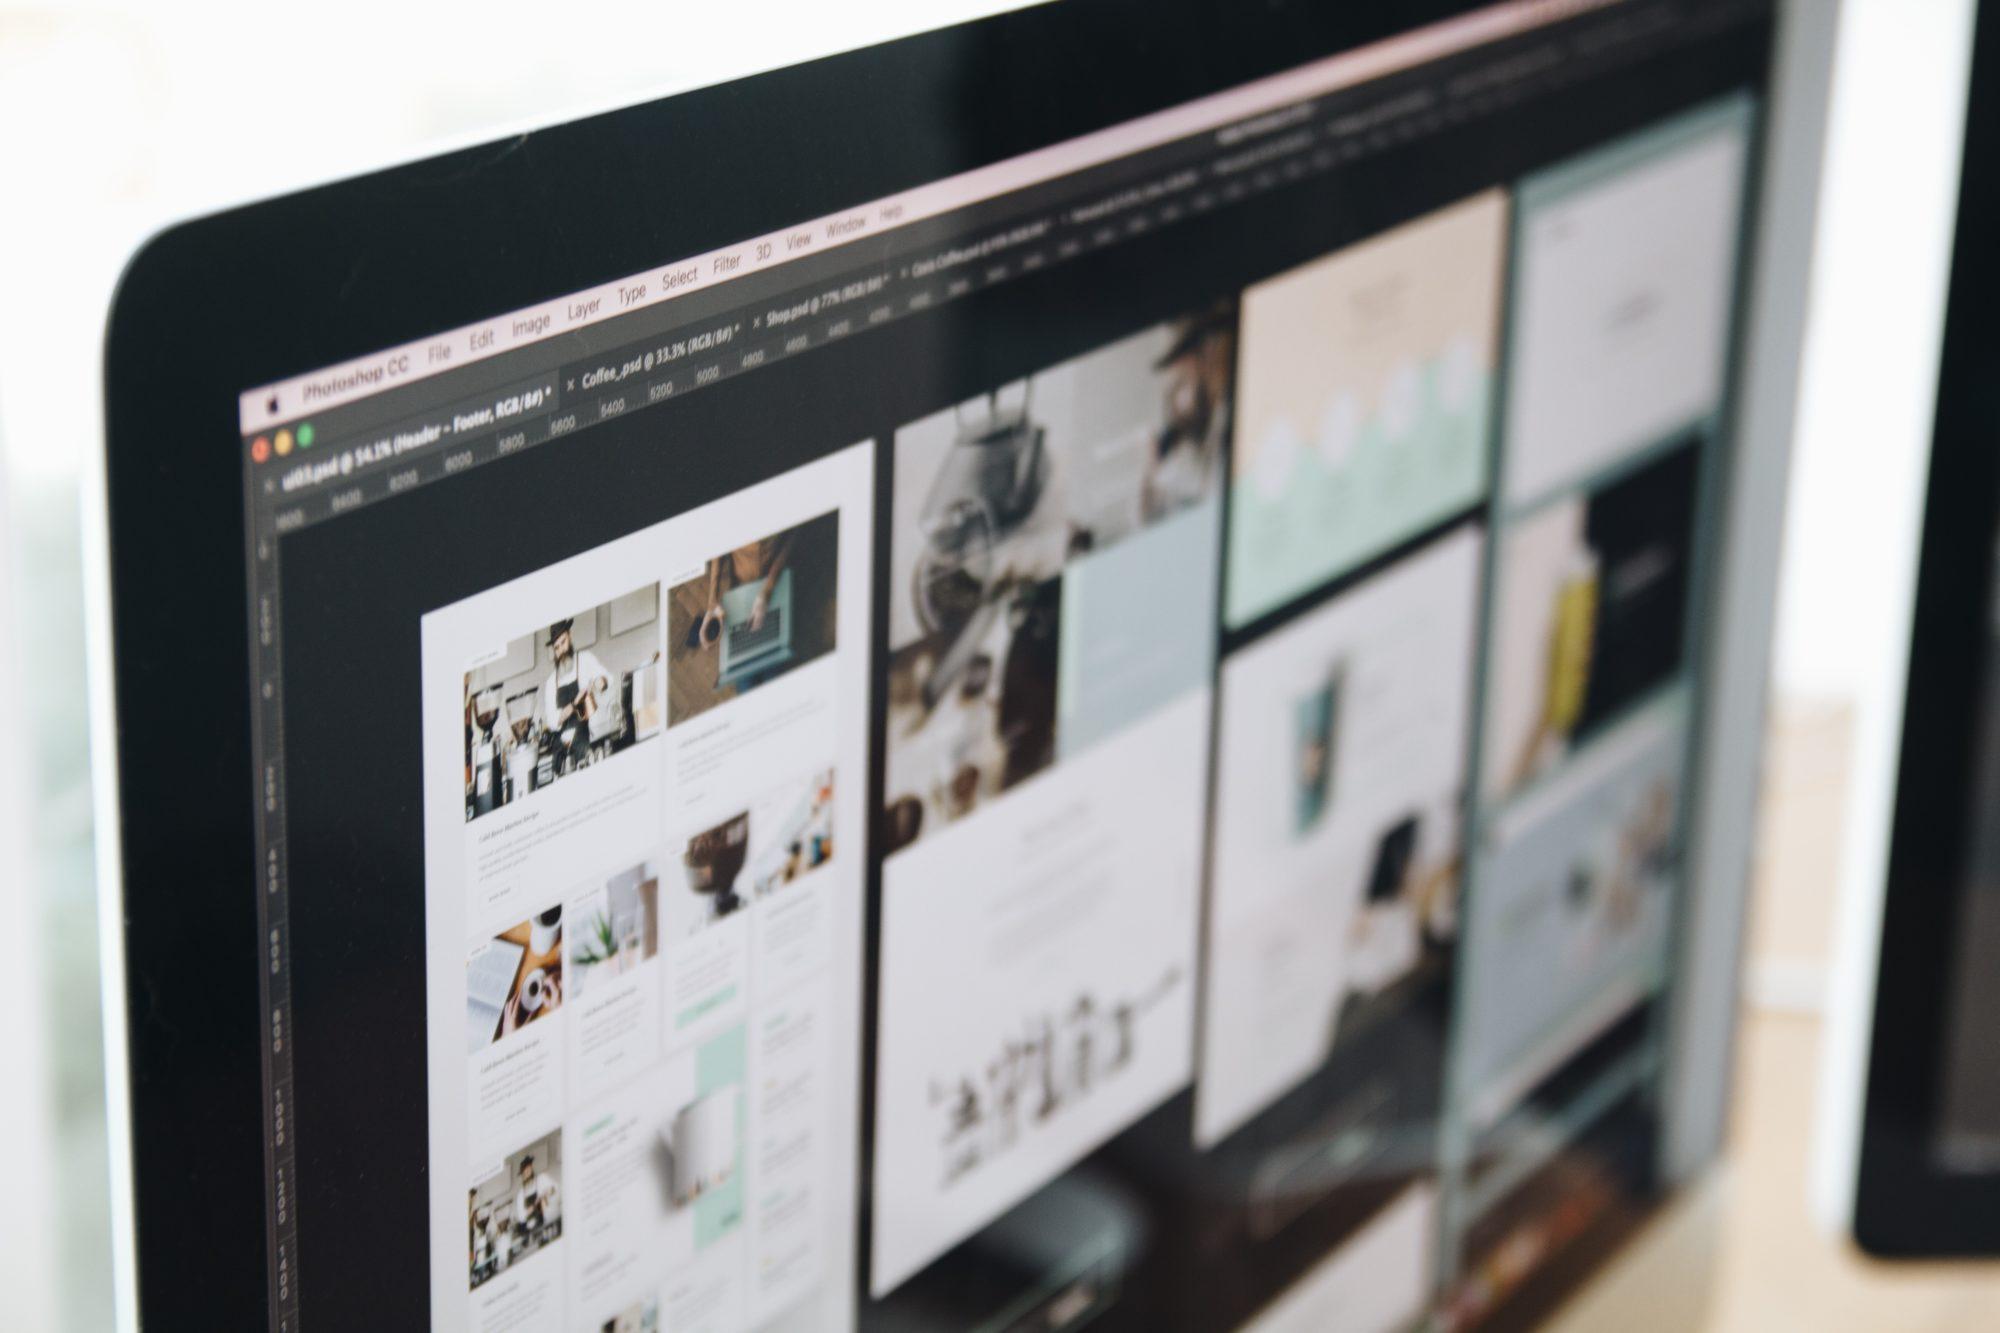 agence communication strasbourg, création graphique, prestations, communication et packaging, branding et logo, webdesign et développement, impression et suivi